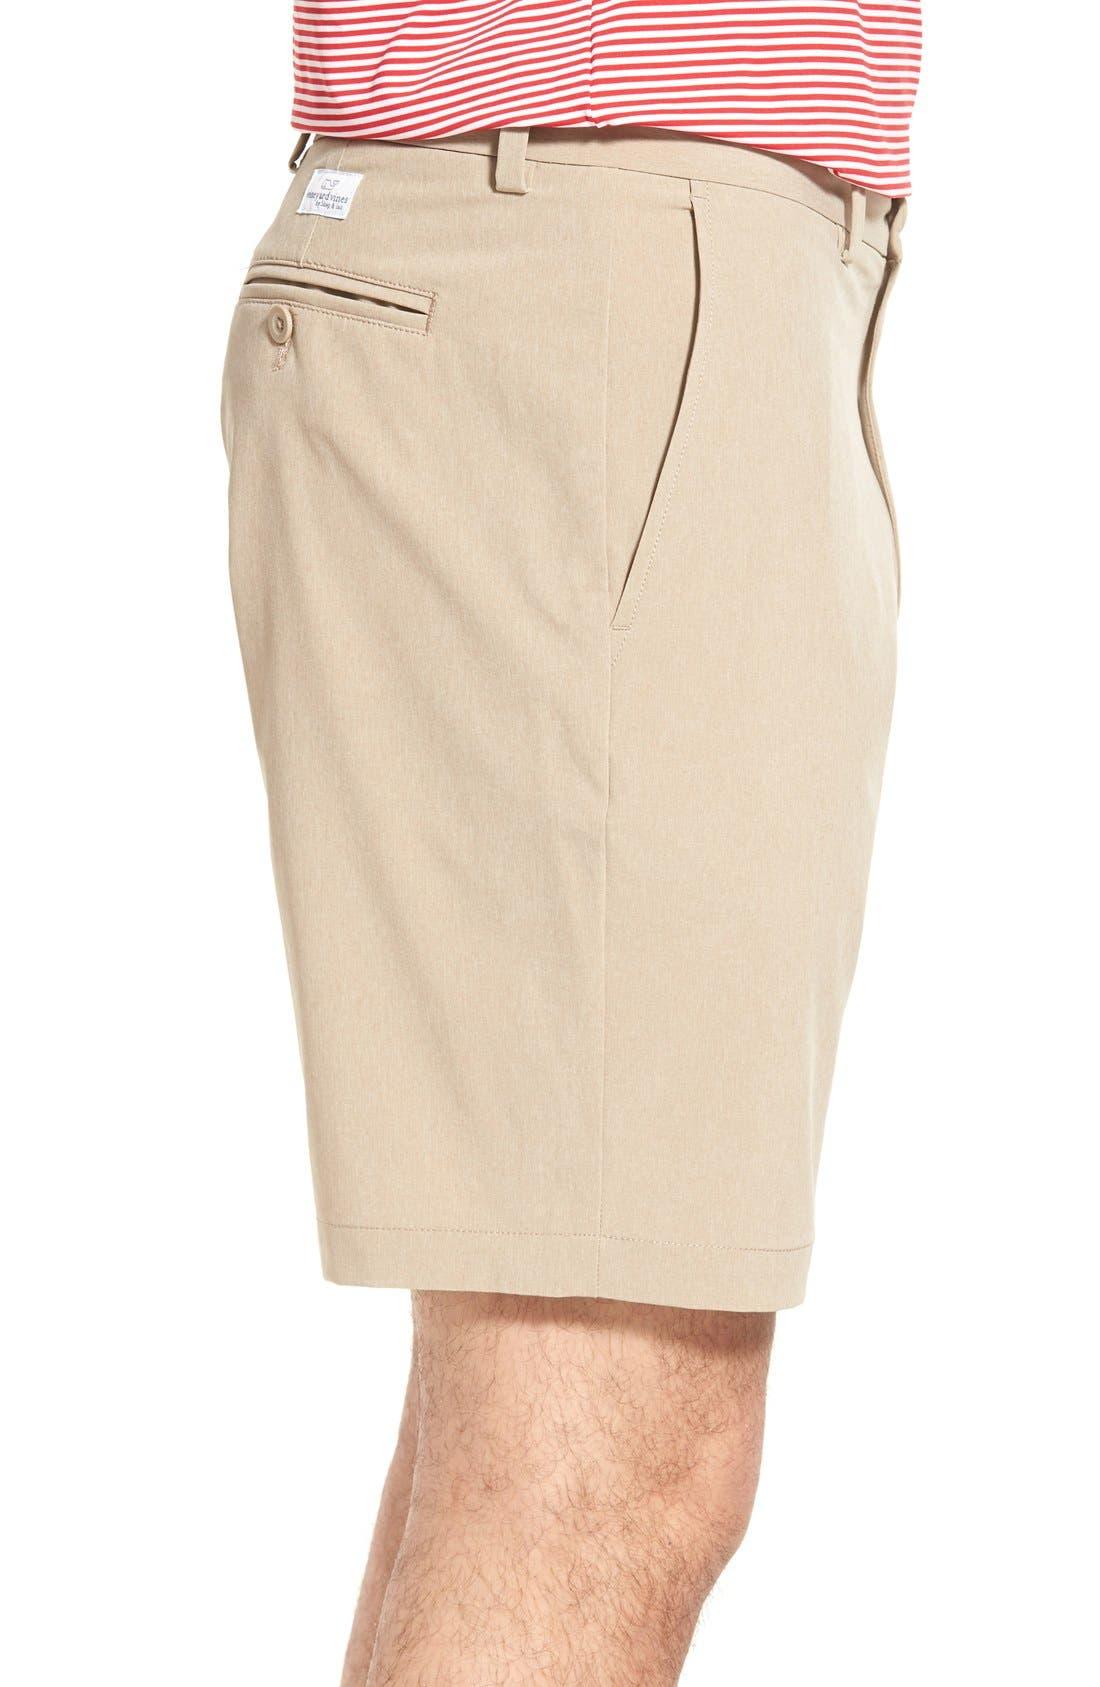 8 Inch Performance Breaker Shorts,                             Alternate thumbnail 75, color,